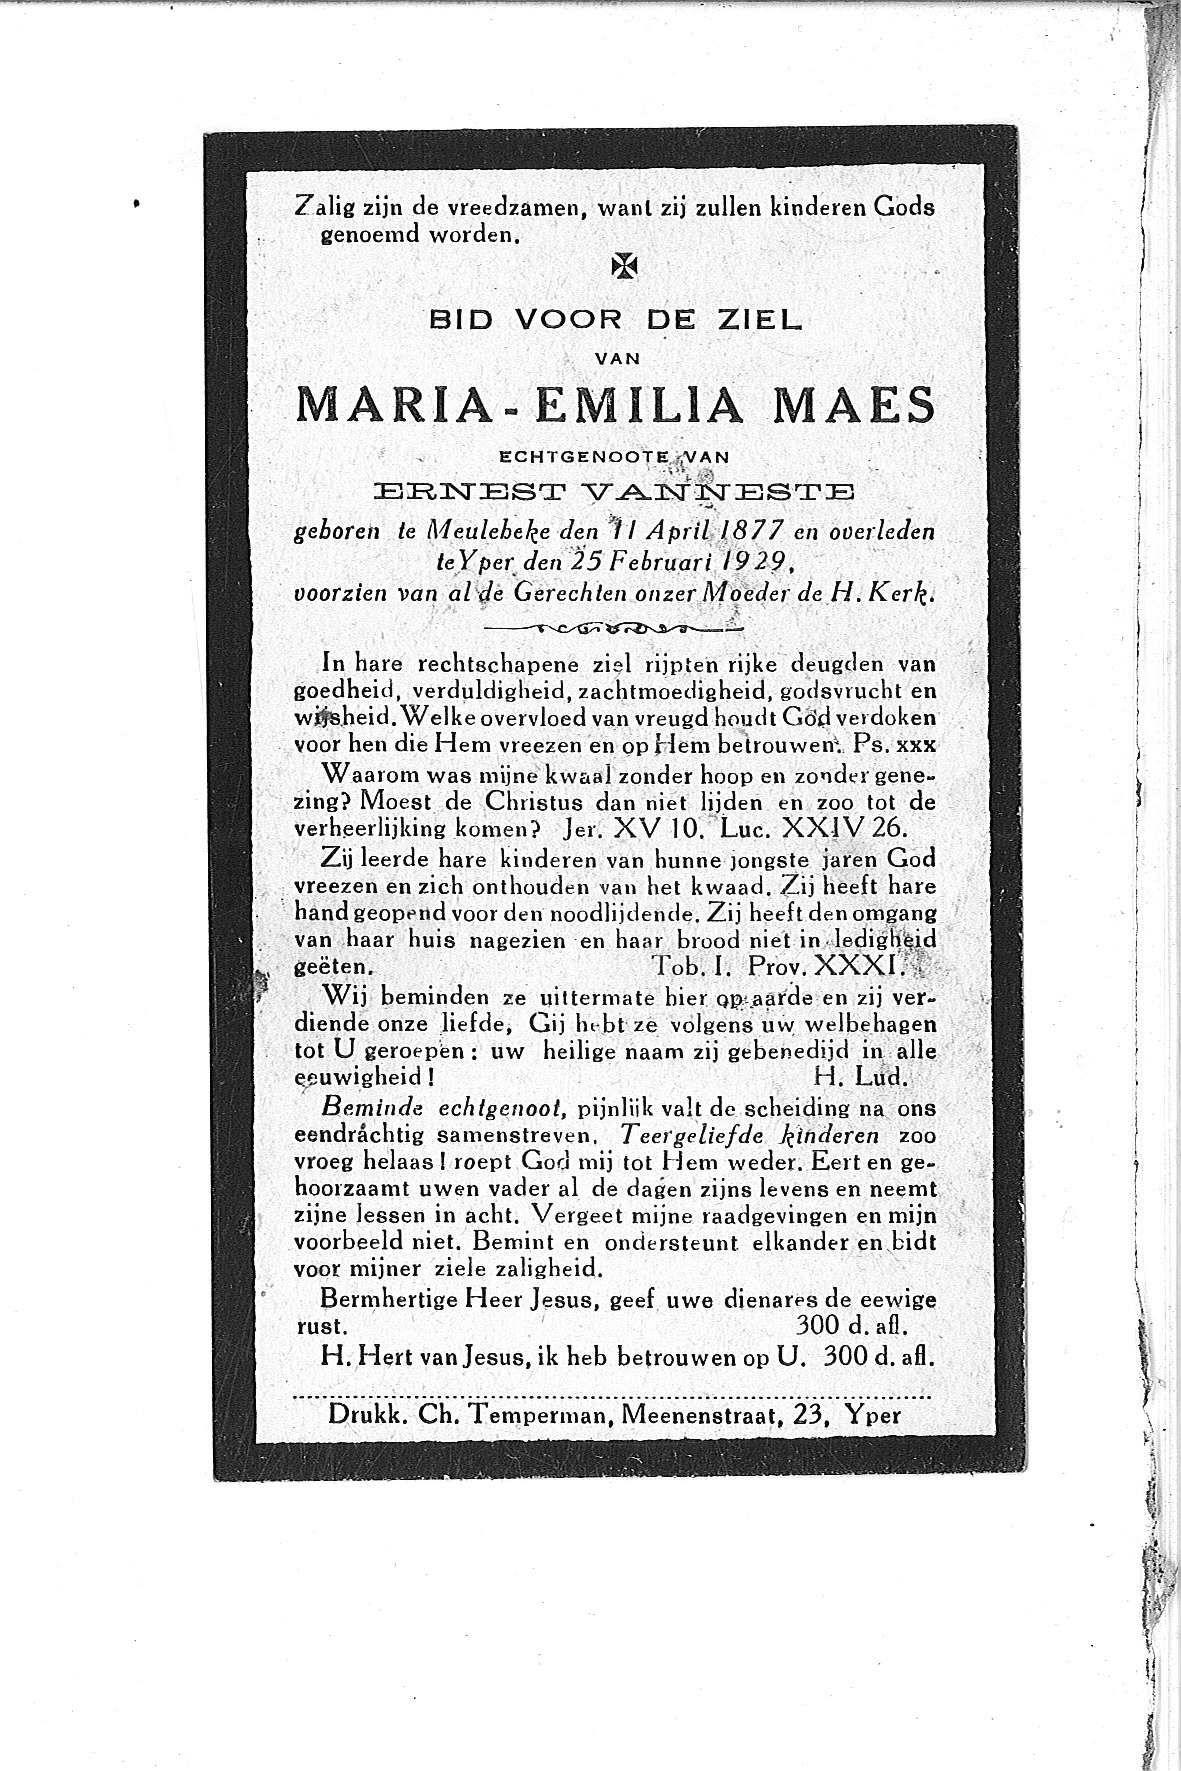 Maria-Emilia(1929)20111109091504_00130.jpg